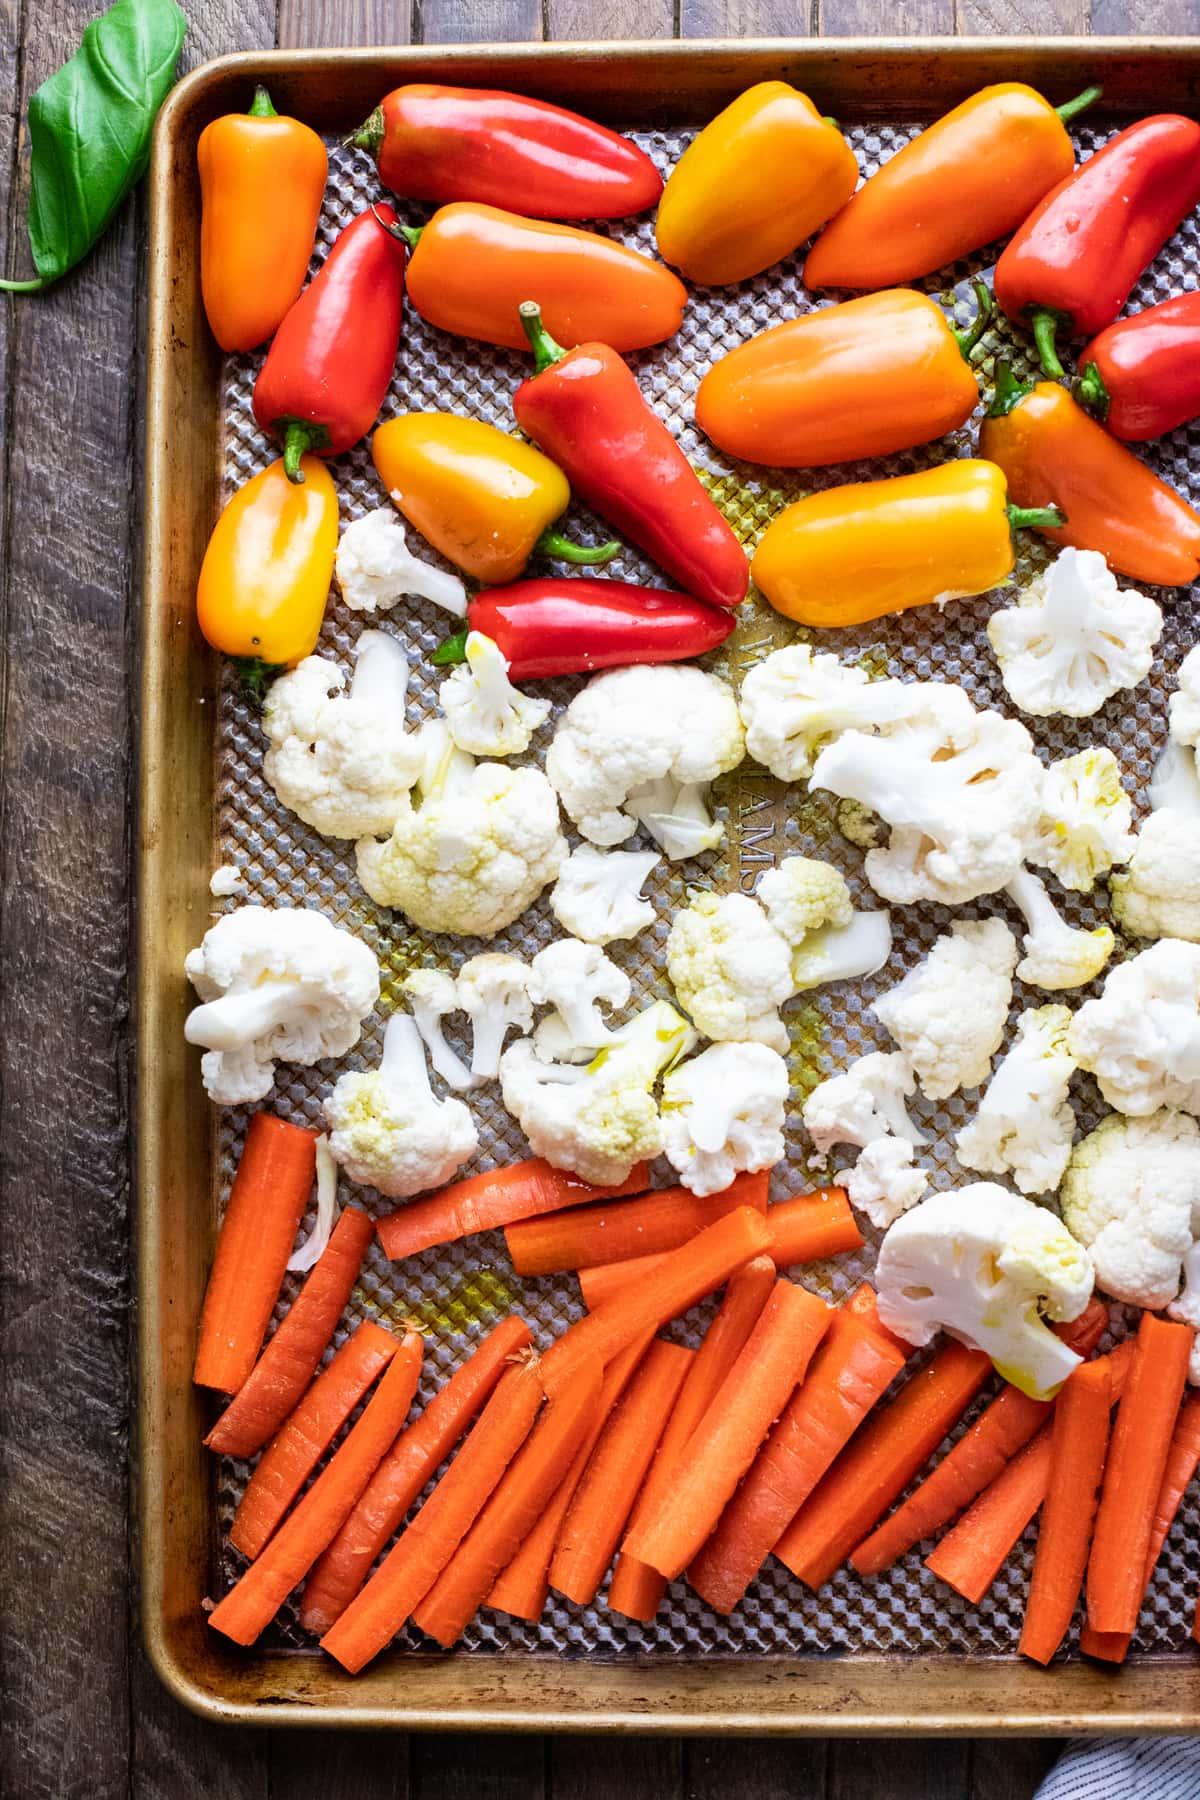 vegetables arranged on sheet pan.